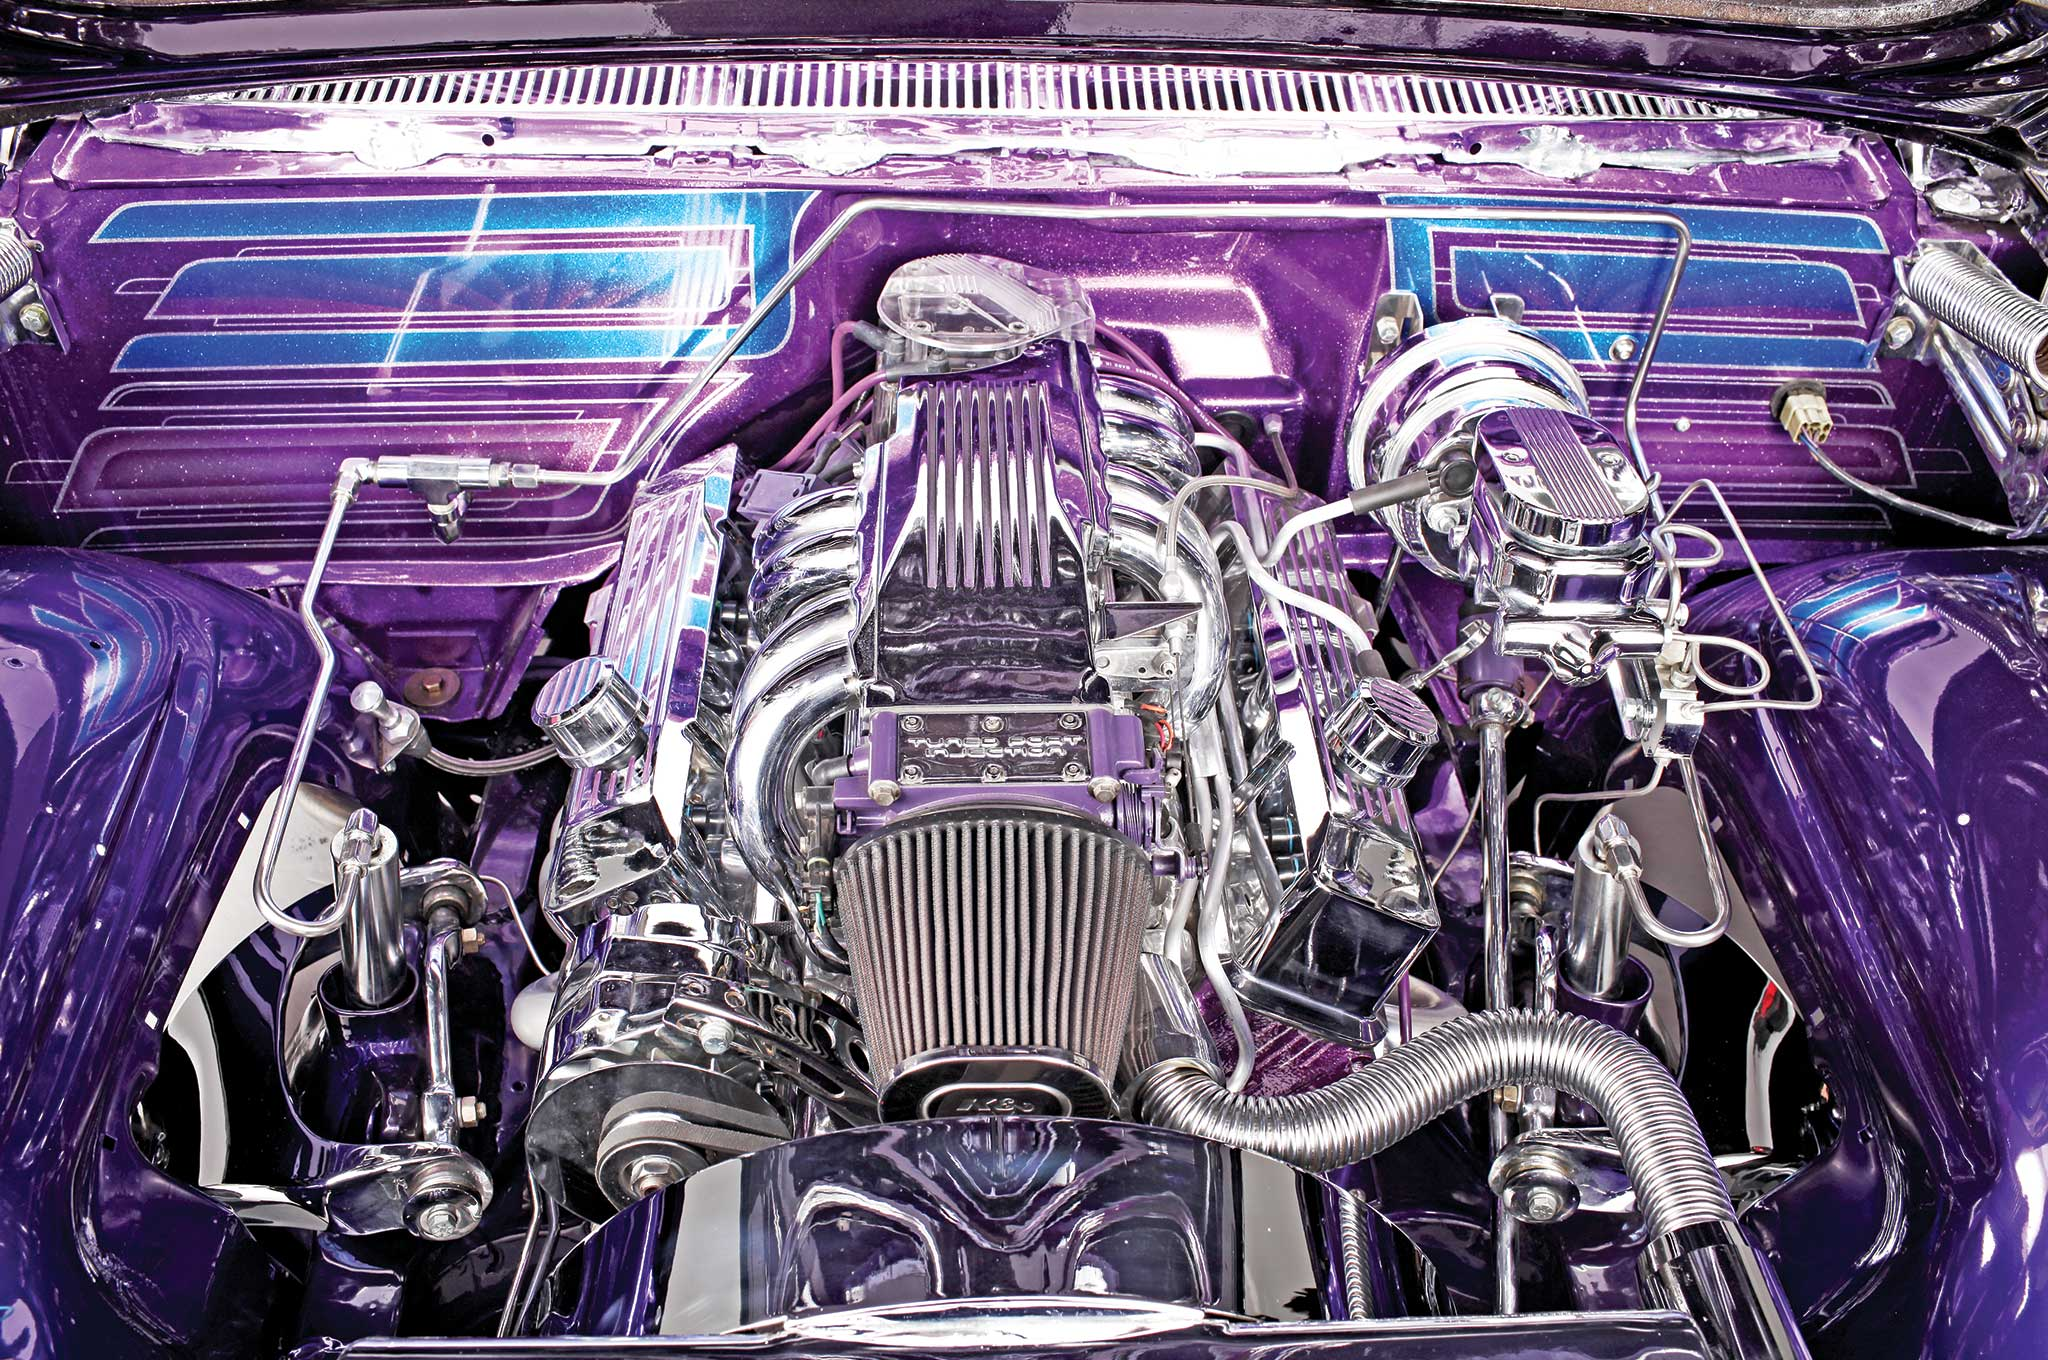 Lowrider 1959 Chevy Impala Rear Wiring Harness